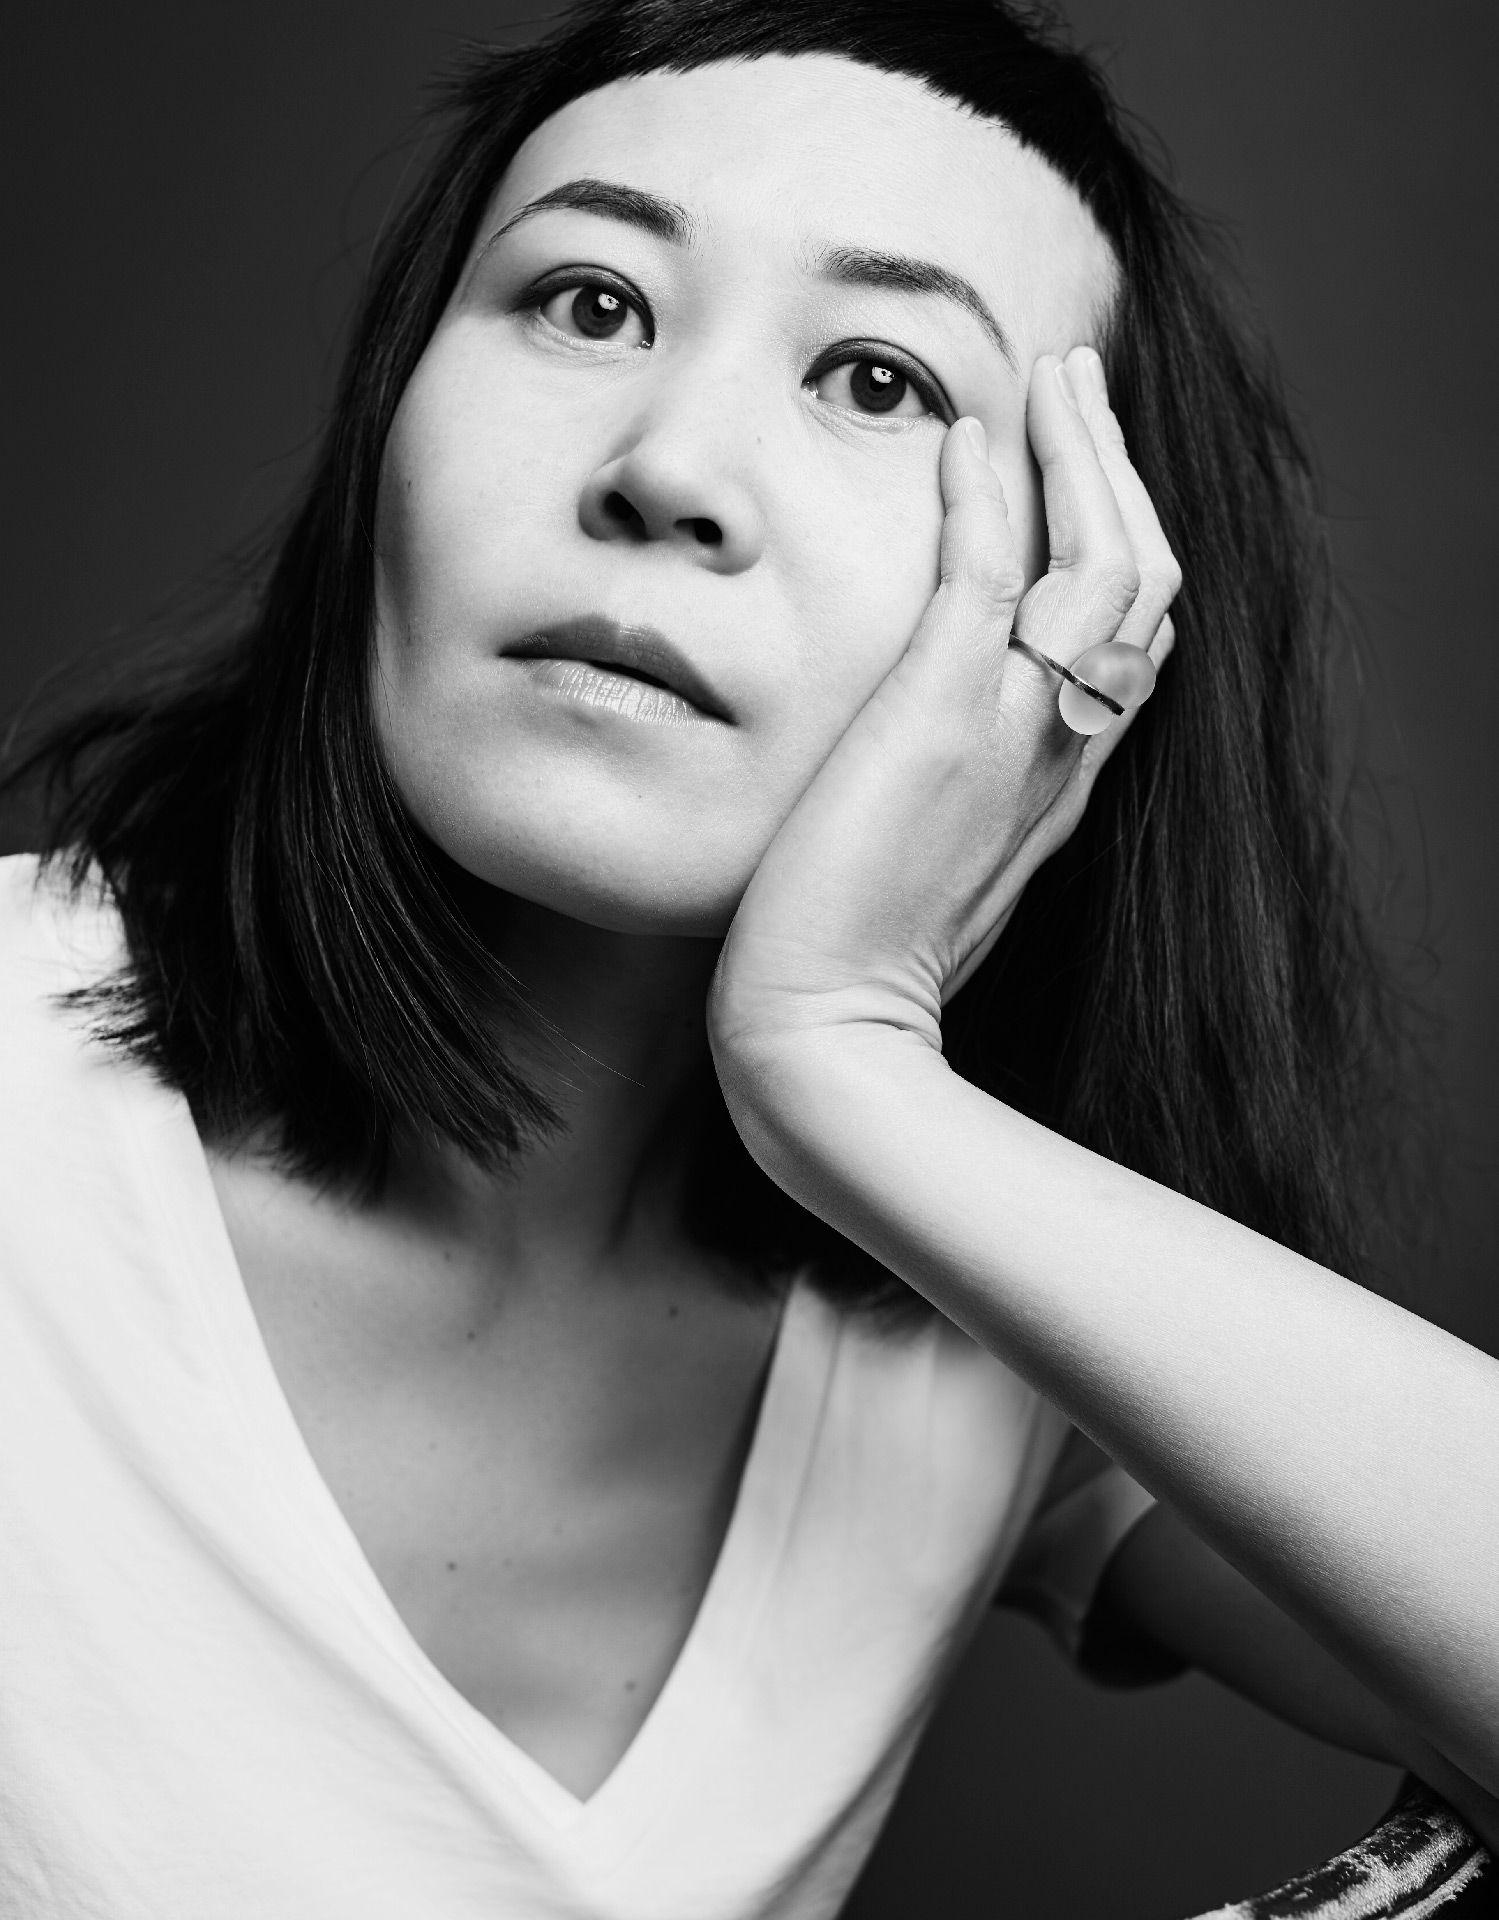 Max Abadian (born in 1967), Ying Gao, 2019, digital print. Maxville Studios, Montreal